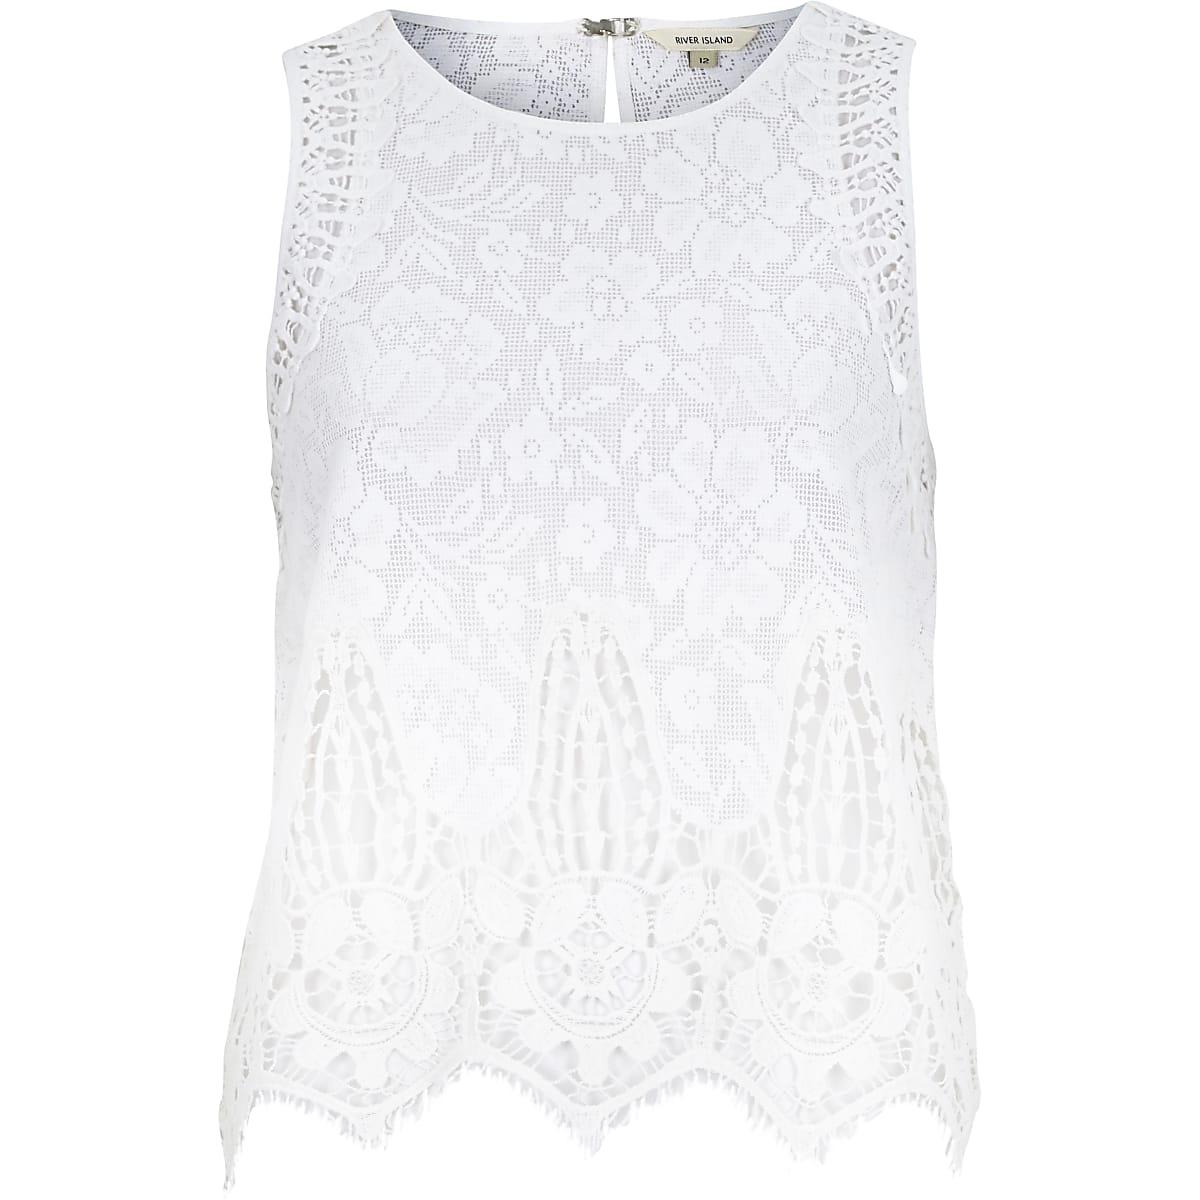 46fc3d4e0b7457 White lace sleeveless tank top - Cami   Sleeveless Tops - Tops - women